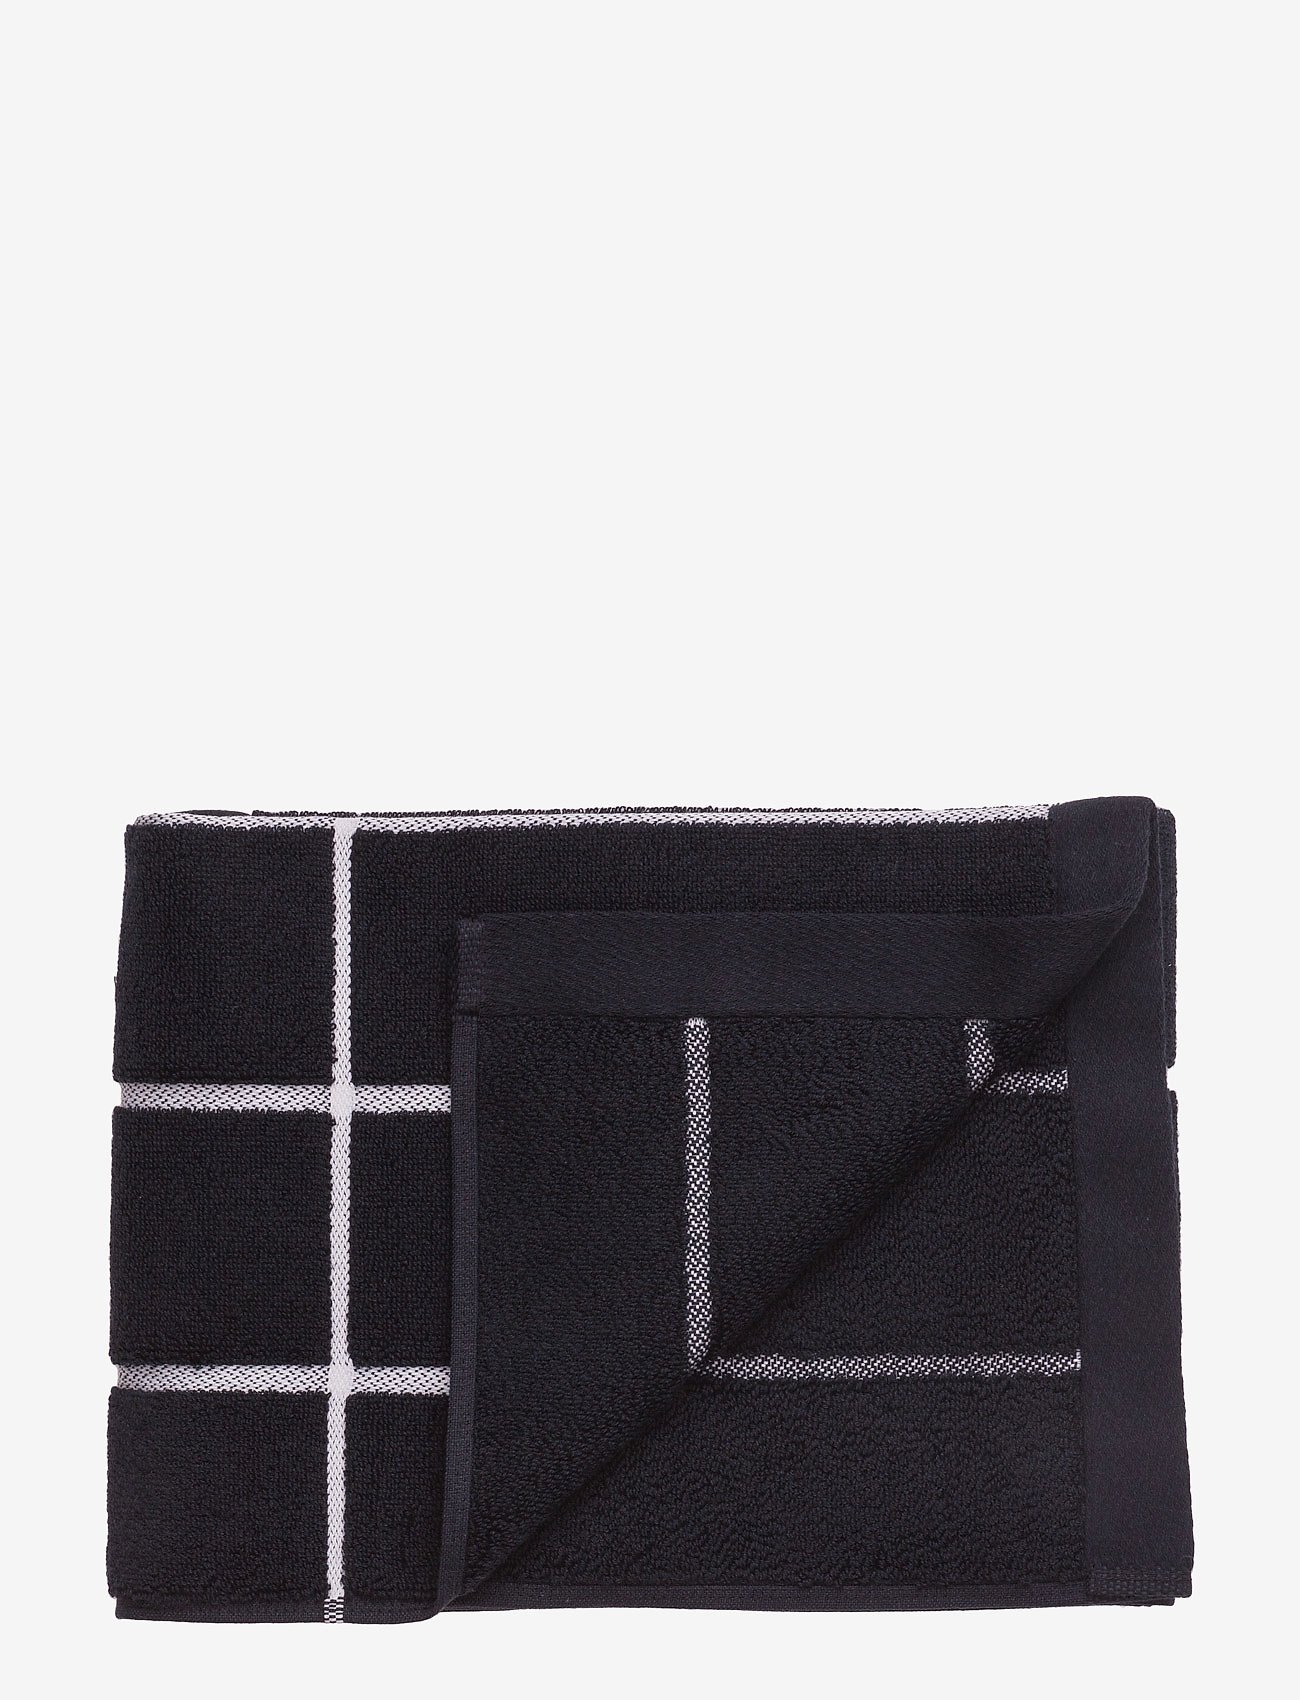 Marimekko Home - TIILISKIVI BATH TOWEL - ręczniki kąpielowe - black, white - 0